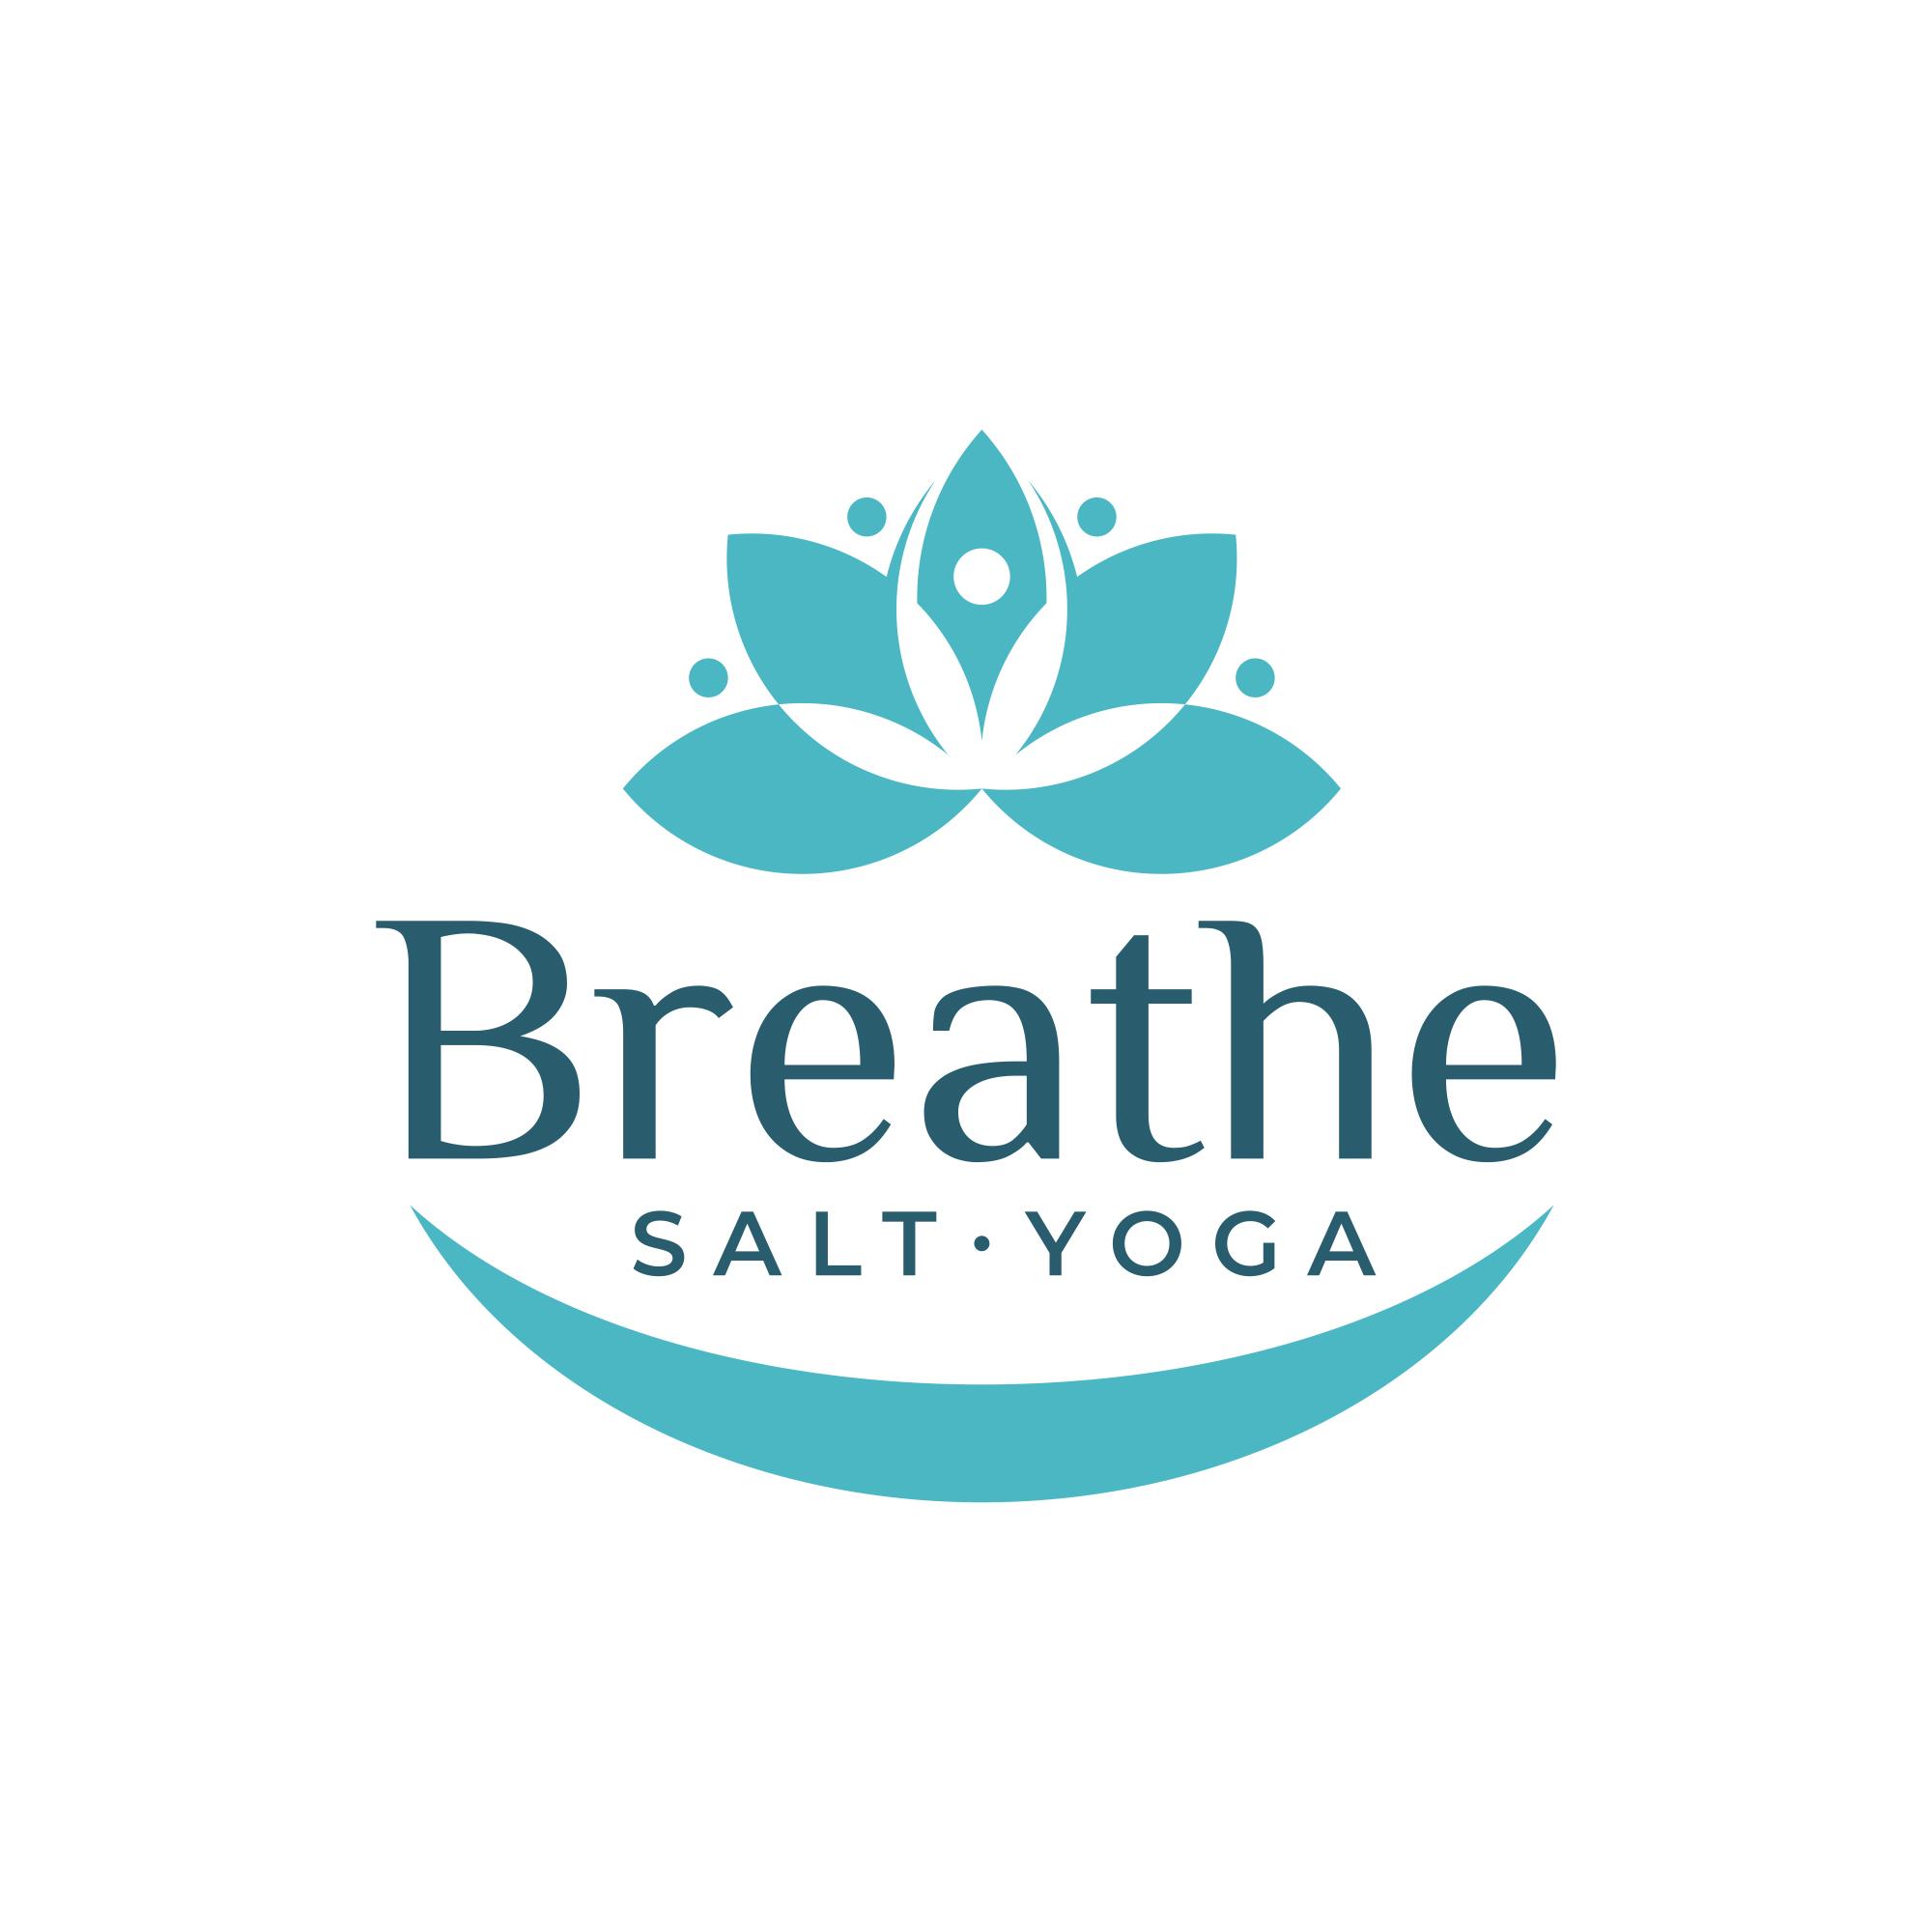 Breathe_Salt_Yoga 2.jpg